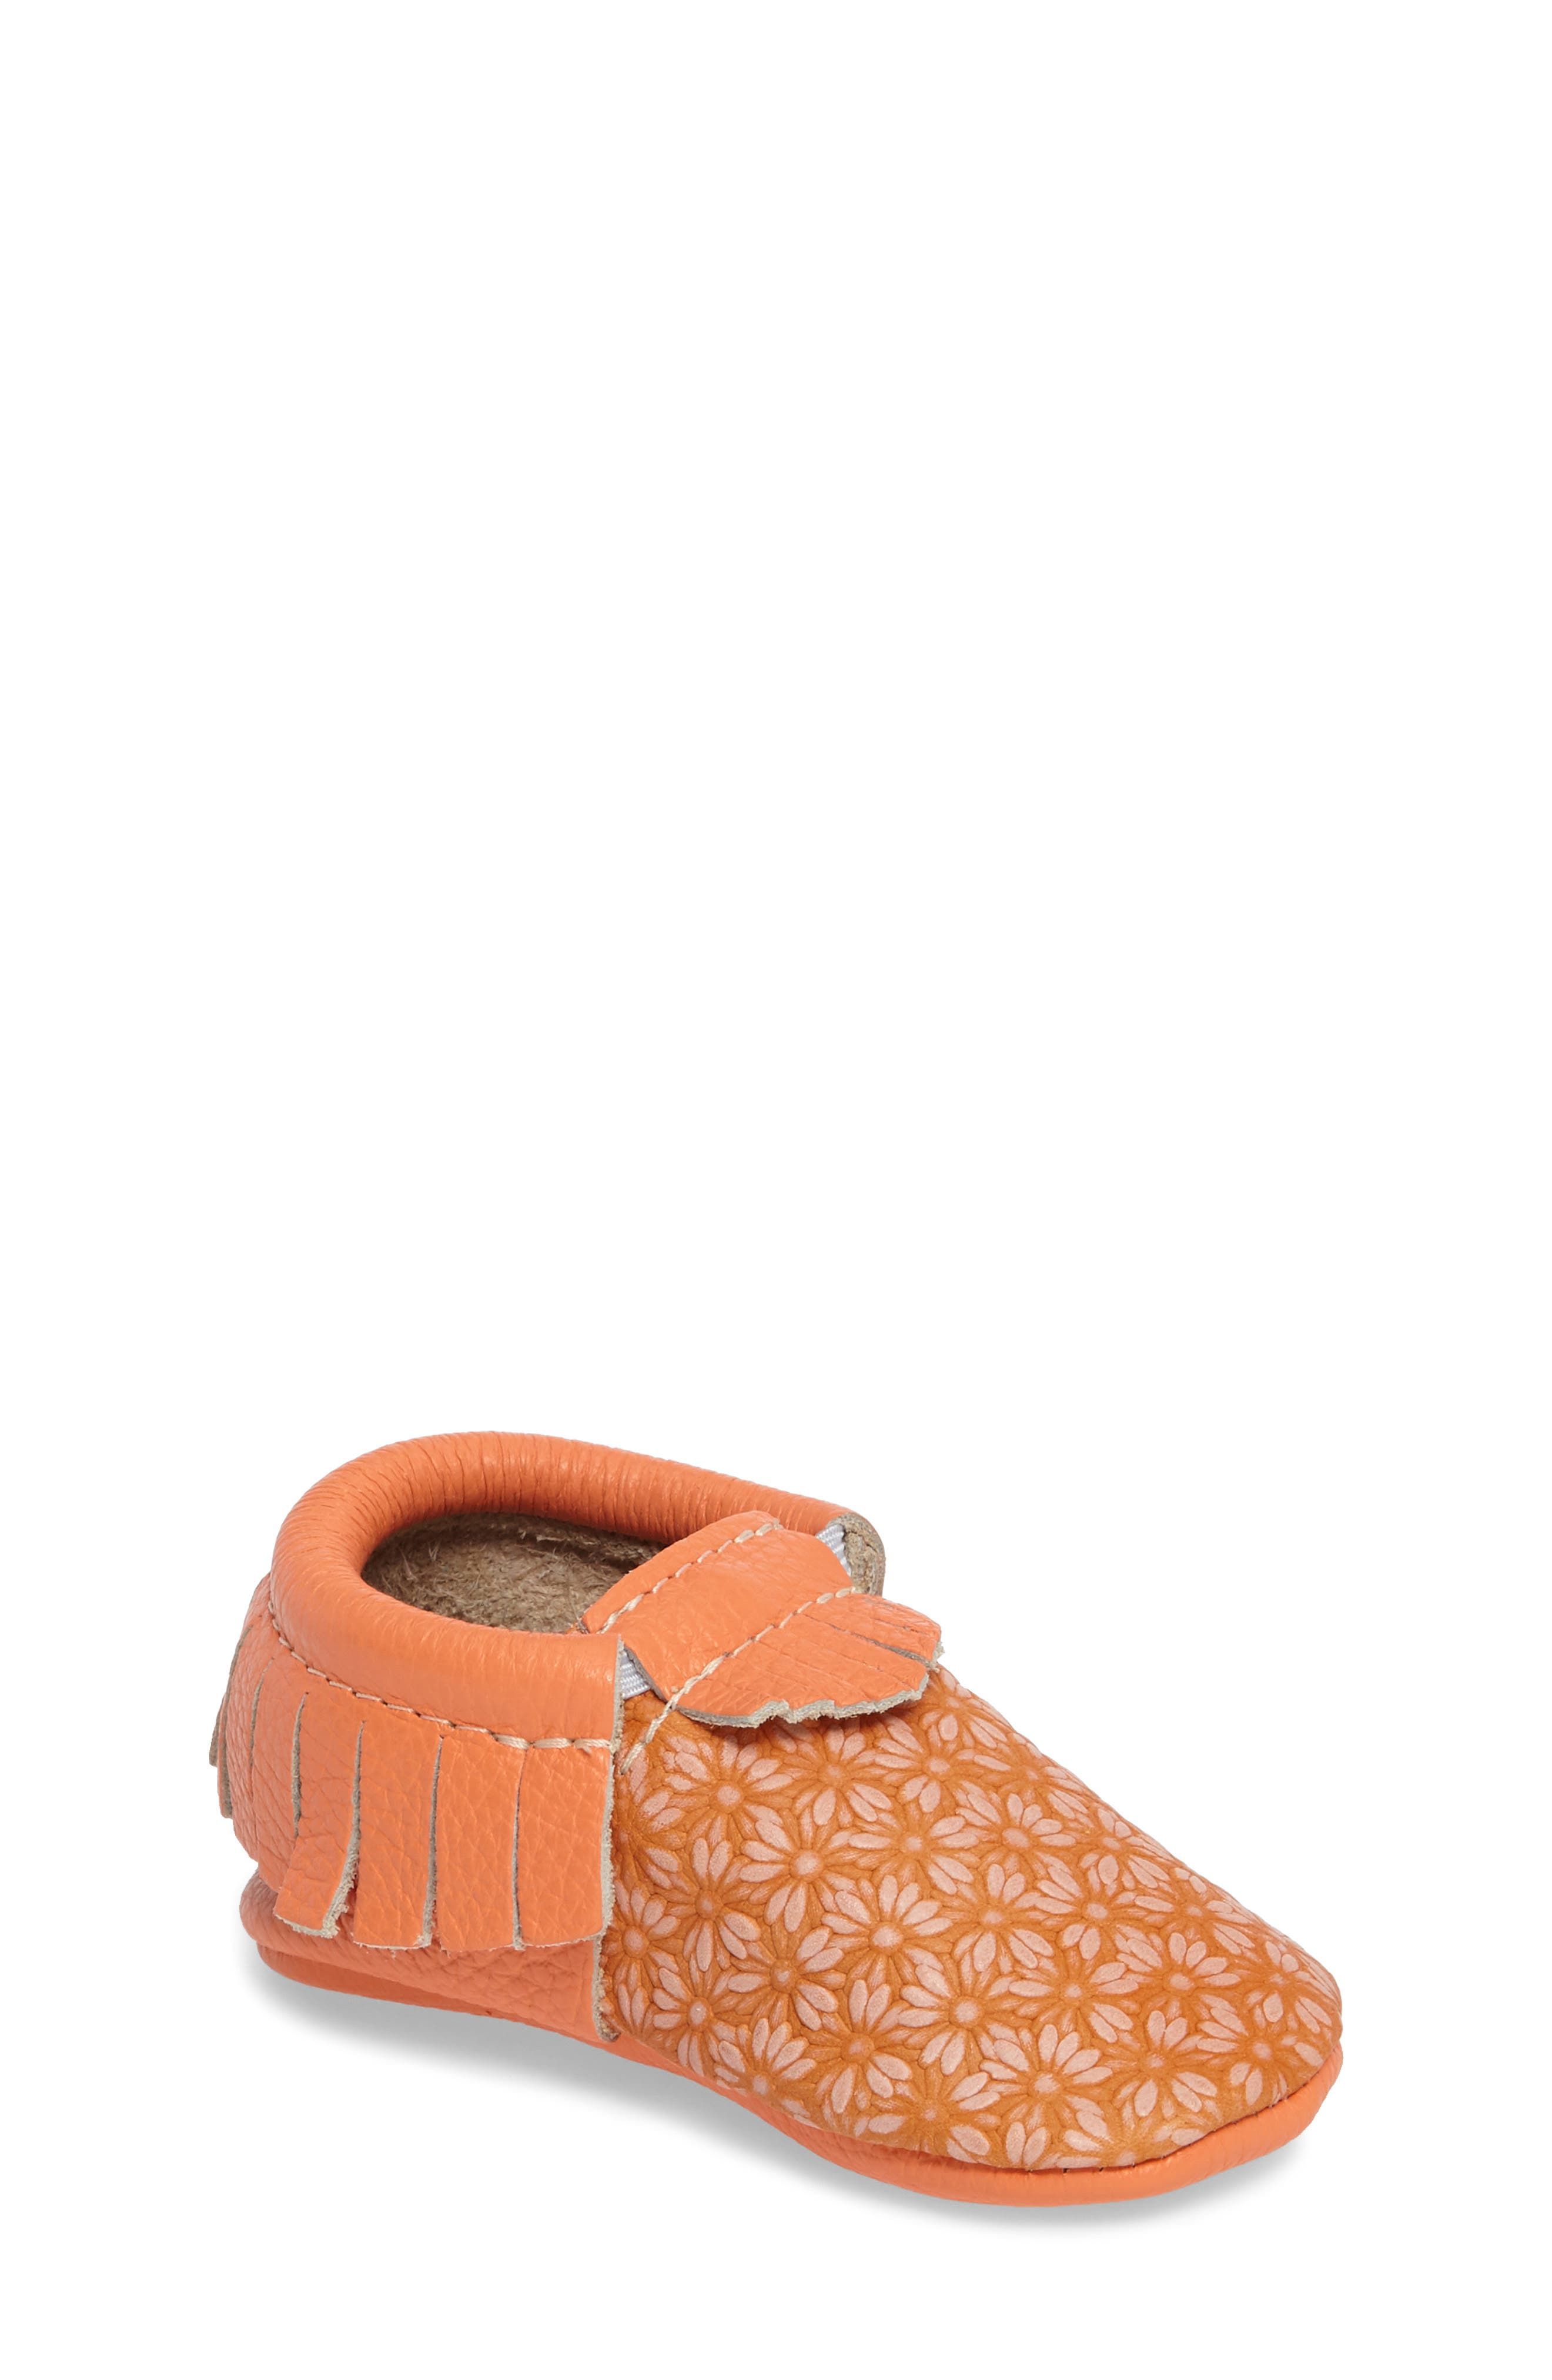 FRESHLY PICKED Daisy Moccasin Crib Shoe